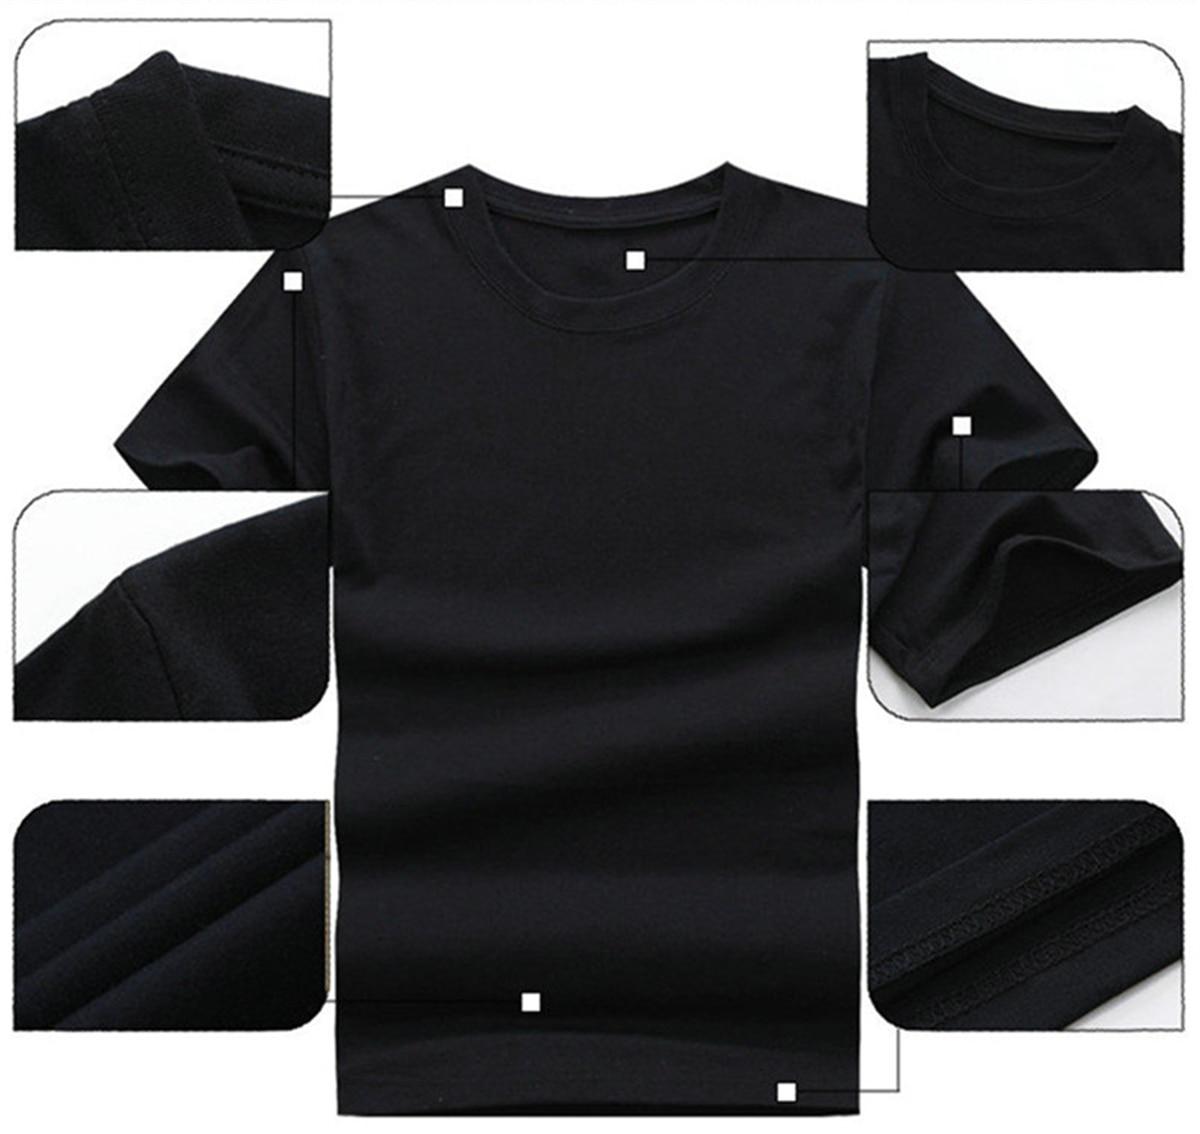 GILDAN Gamer Problems #2 Funny Gaming T-Shirt 100% cotton T-shirt glasses Womens T-shirt